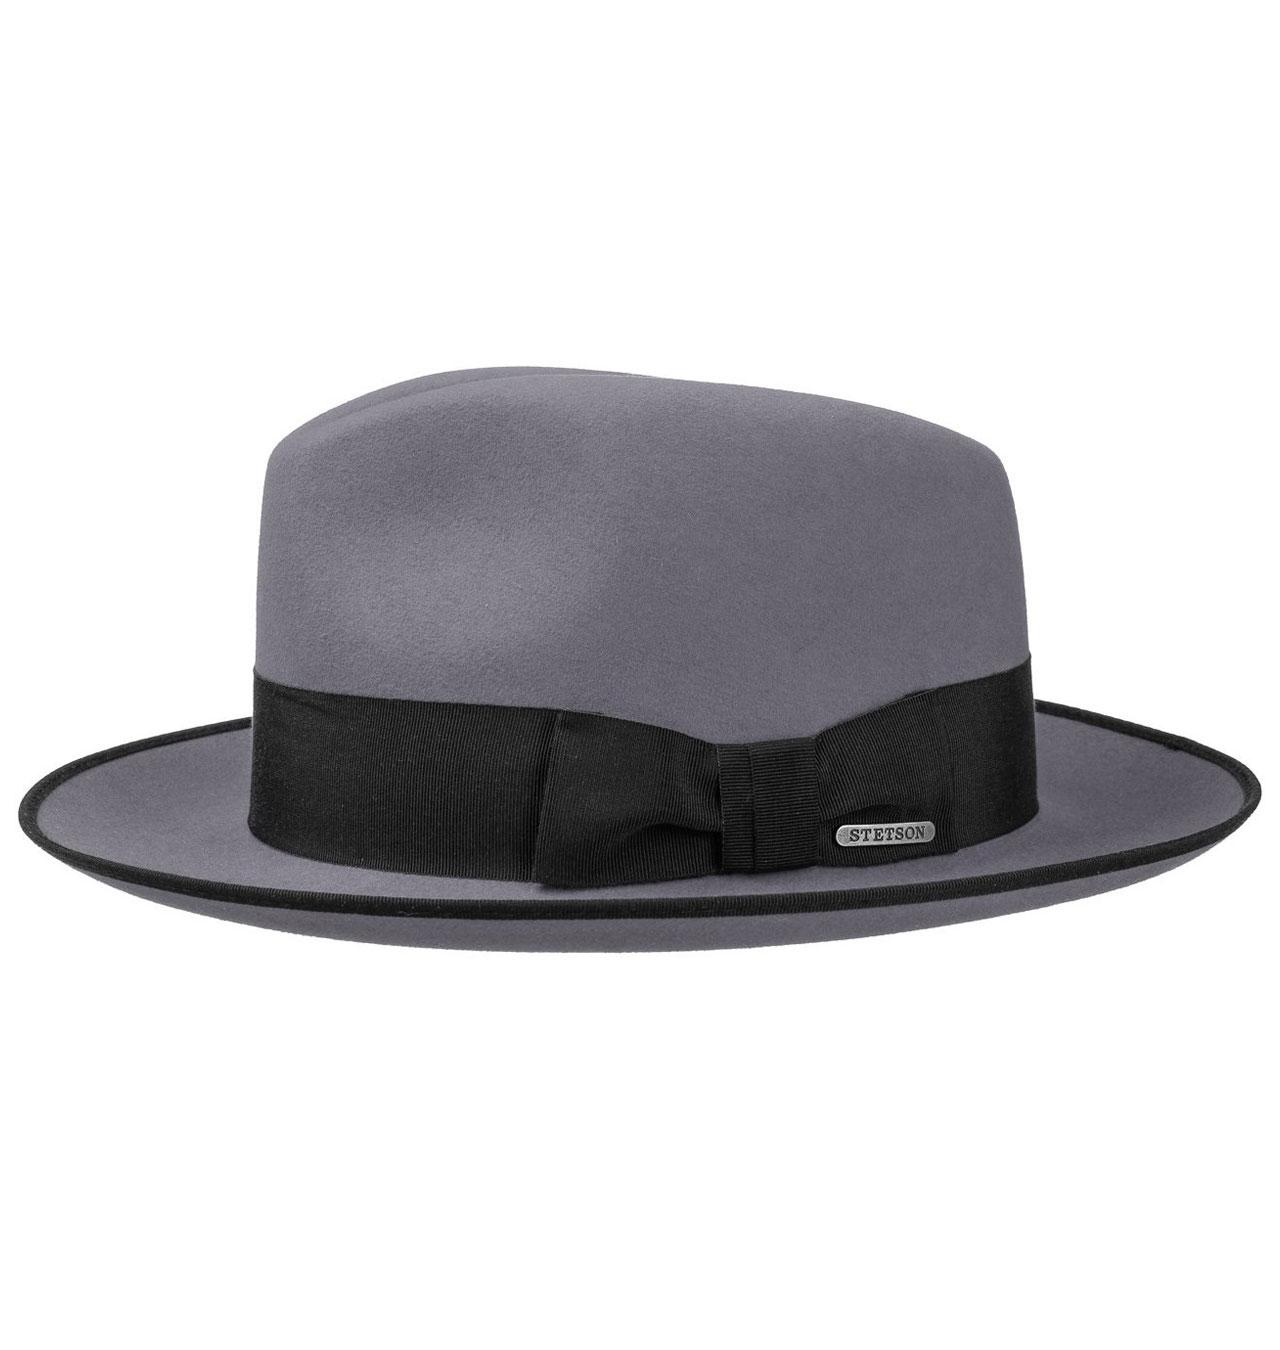 Stetson---Penn-Fedora-Fur-Felt-Hat---Grey-2.jpg ef24e6d2088